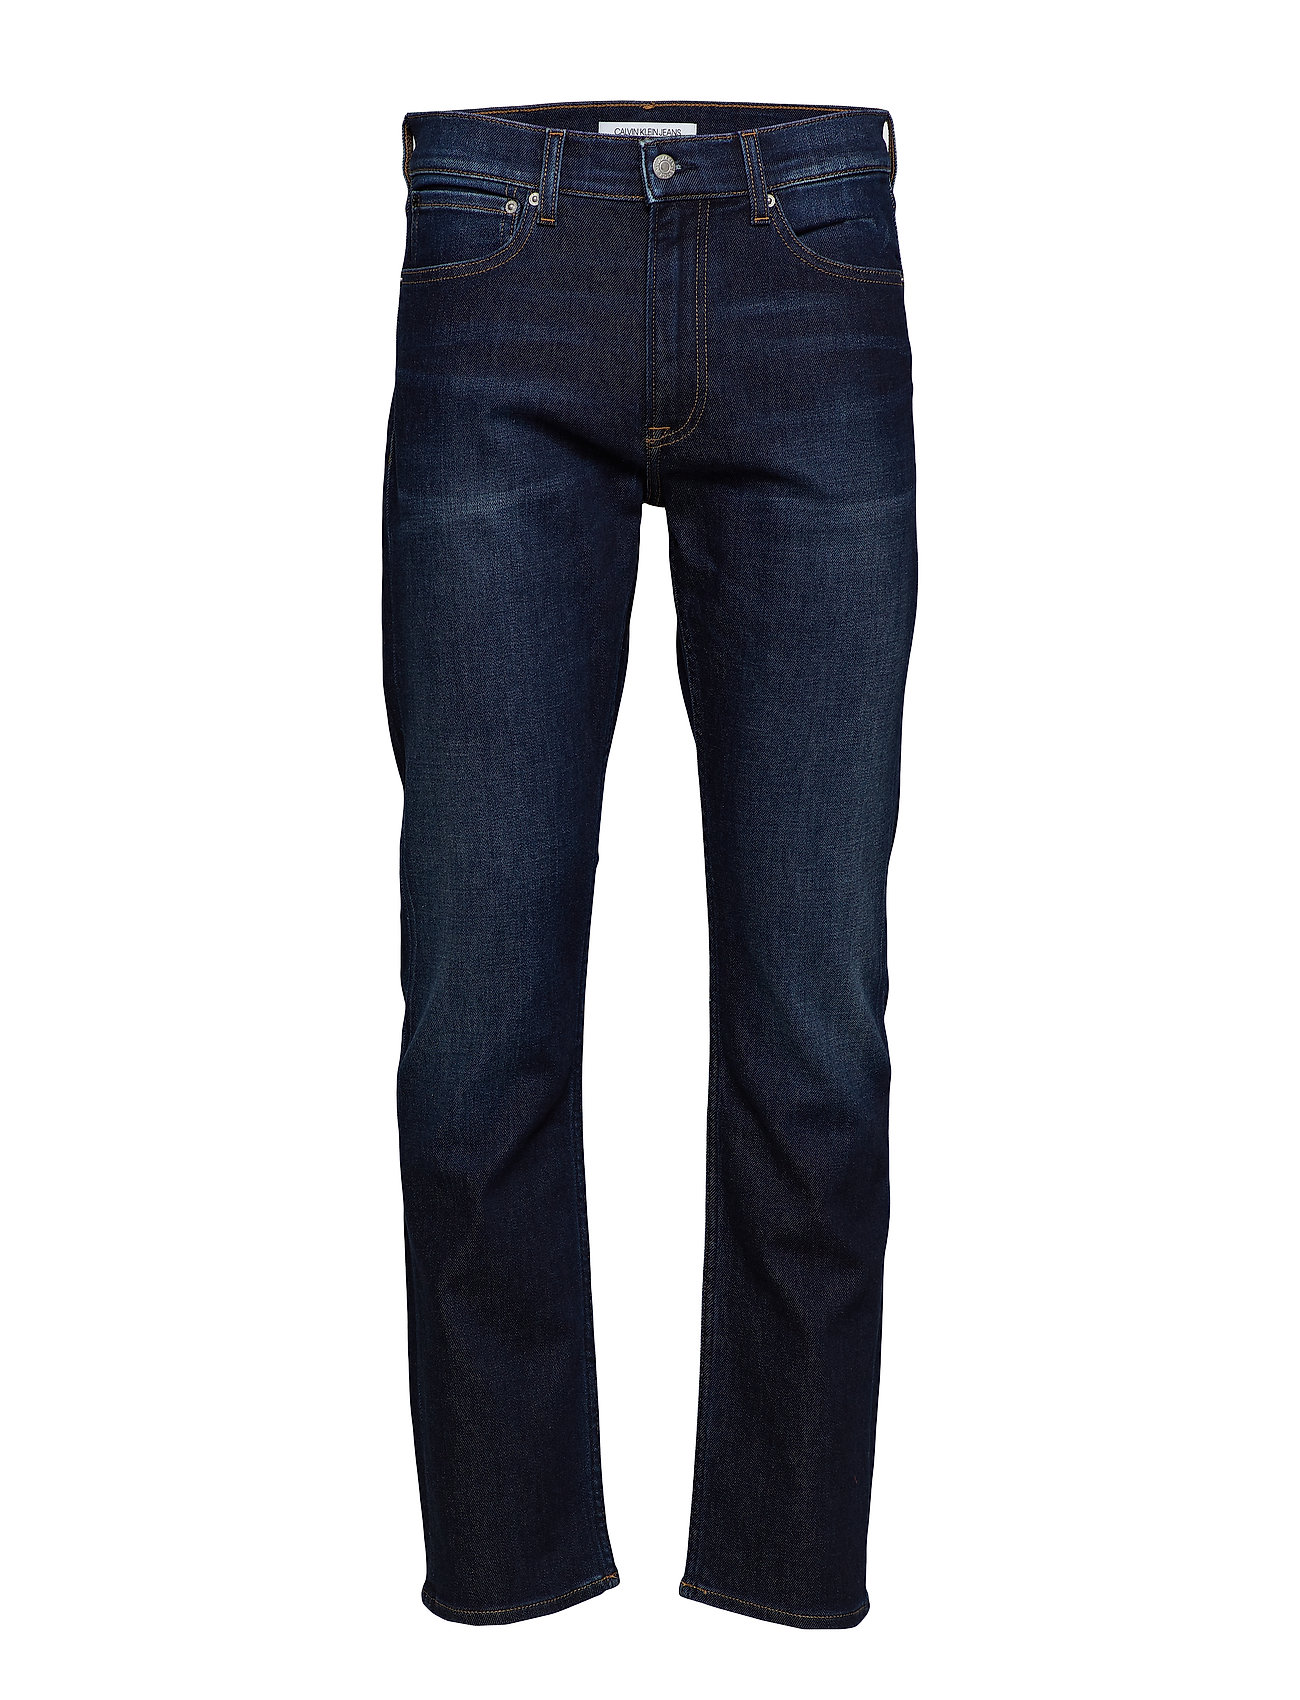 035 Klein Straightdigereedoo Jeans BluebrushedCalvin Ckj nm8Nv0w